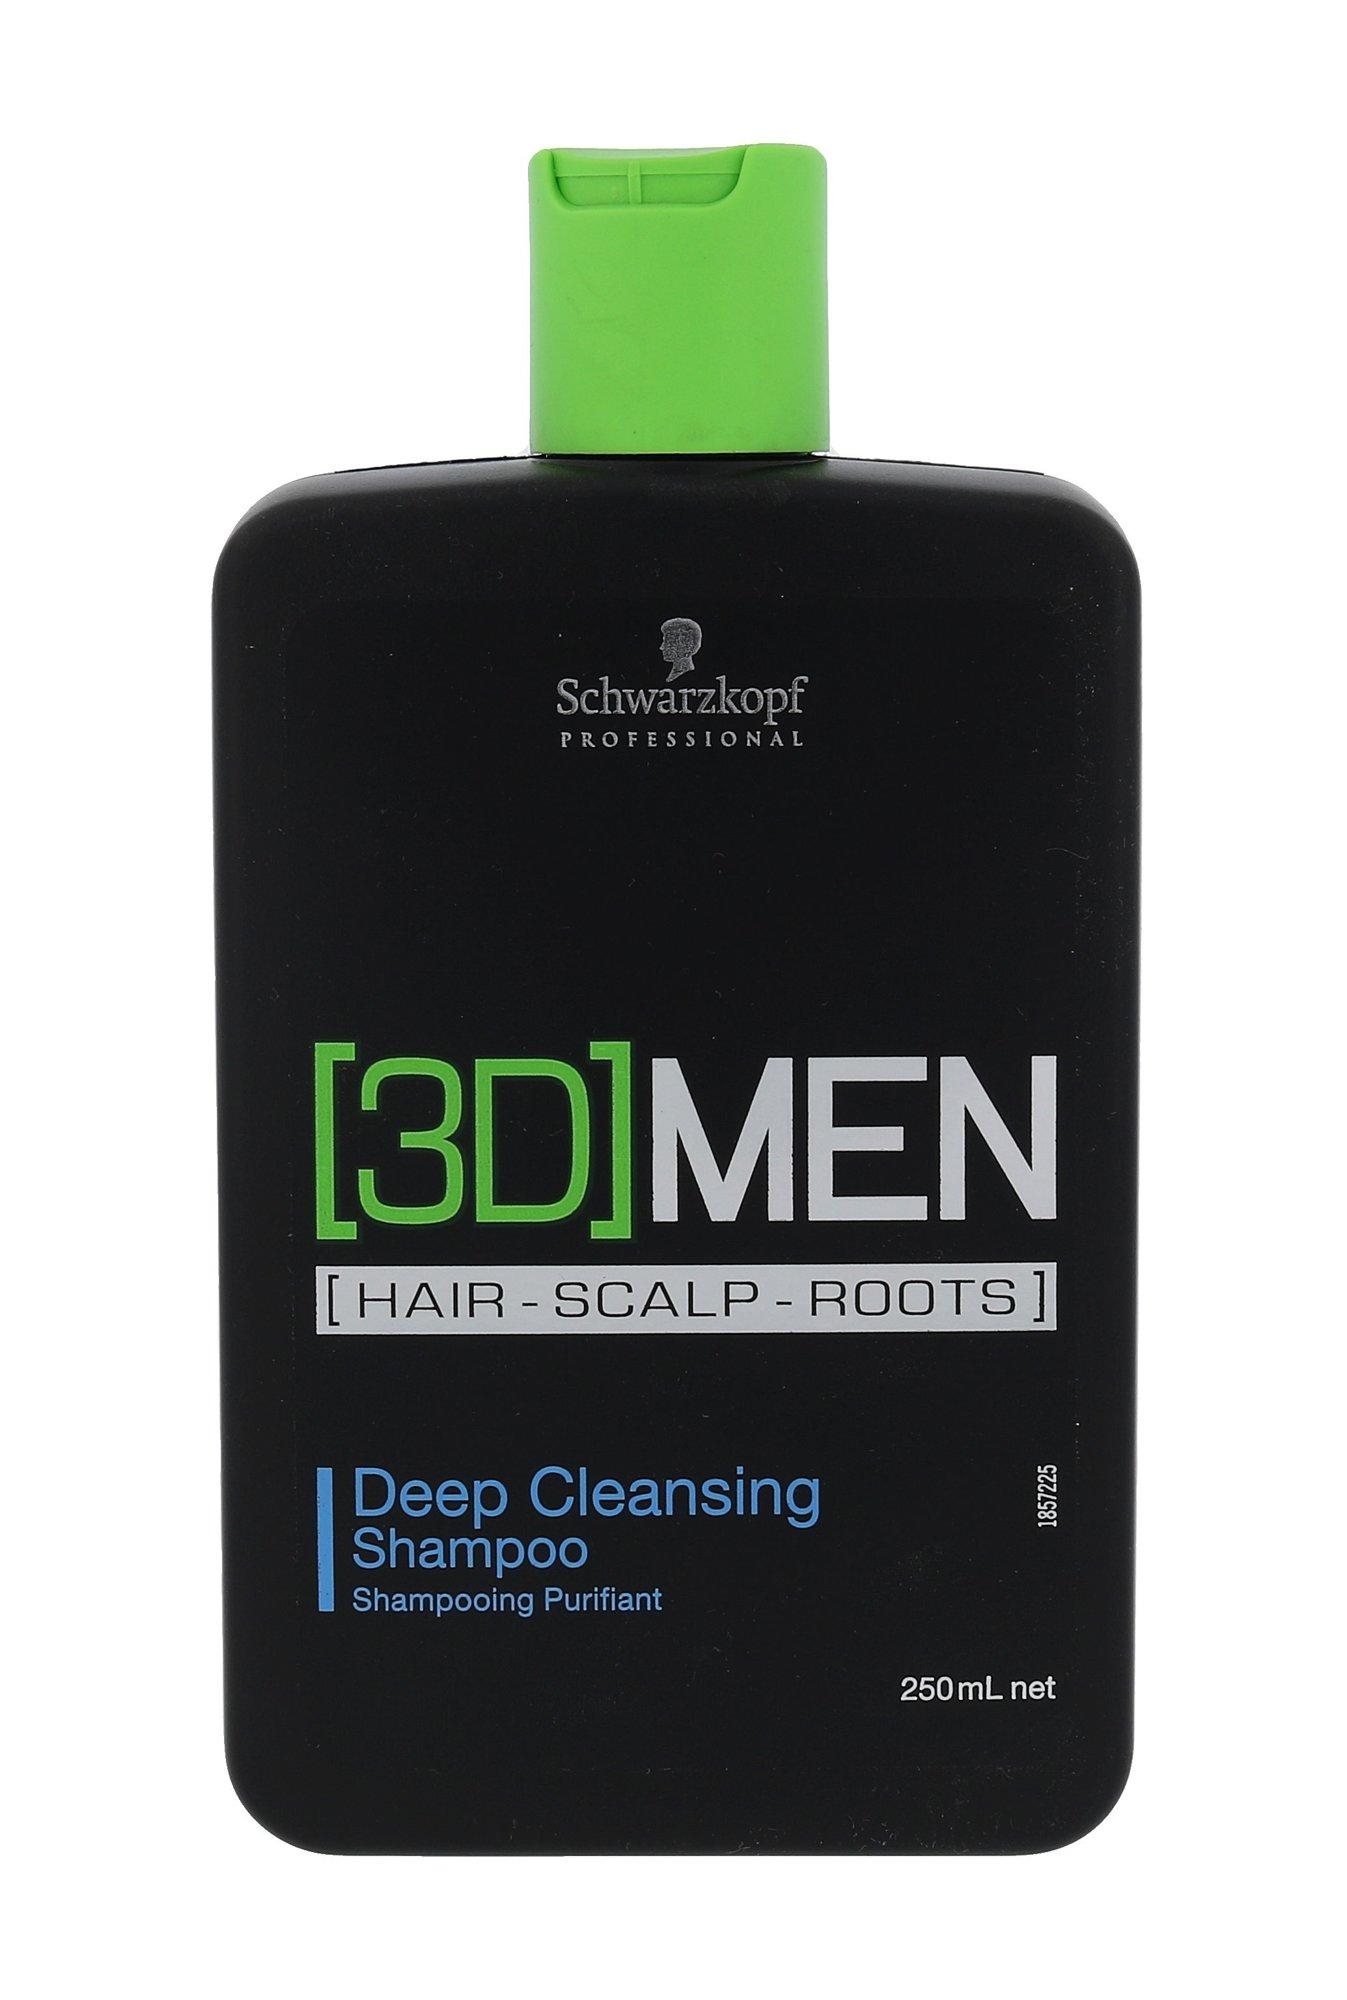 Schwarzkopf Professional 3DMEN Cosmetic 250ml